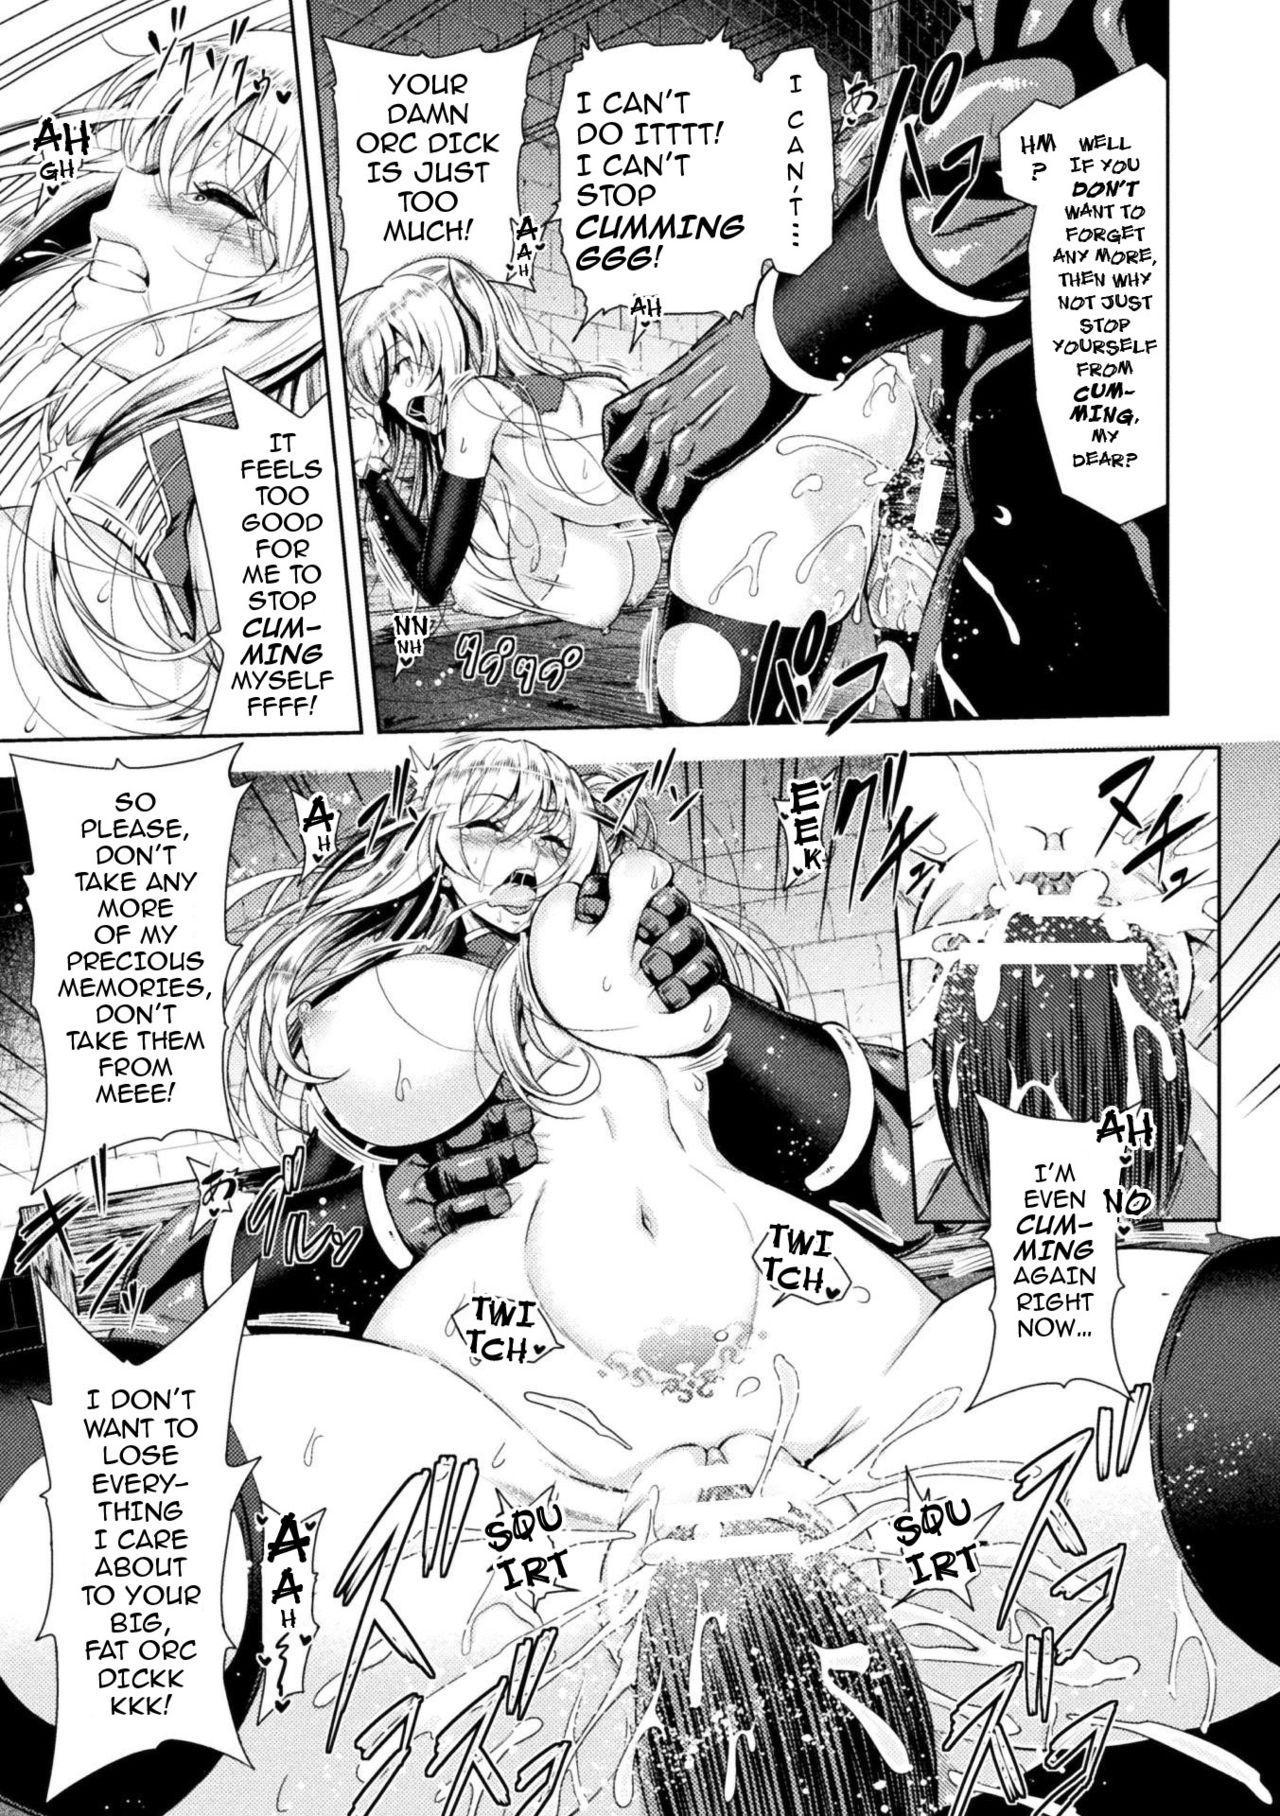 [Yamada Gogogo] Erona ~Orc no Inmon ni Okasareta Onna Kishi no Matsuro~ | Erona ~The Fall of a Beautiful Knight Cursed with the Lewd Mark of an Orc~ [English] {darknight} 45